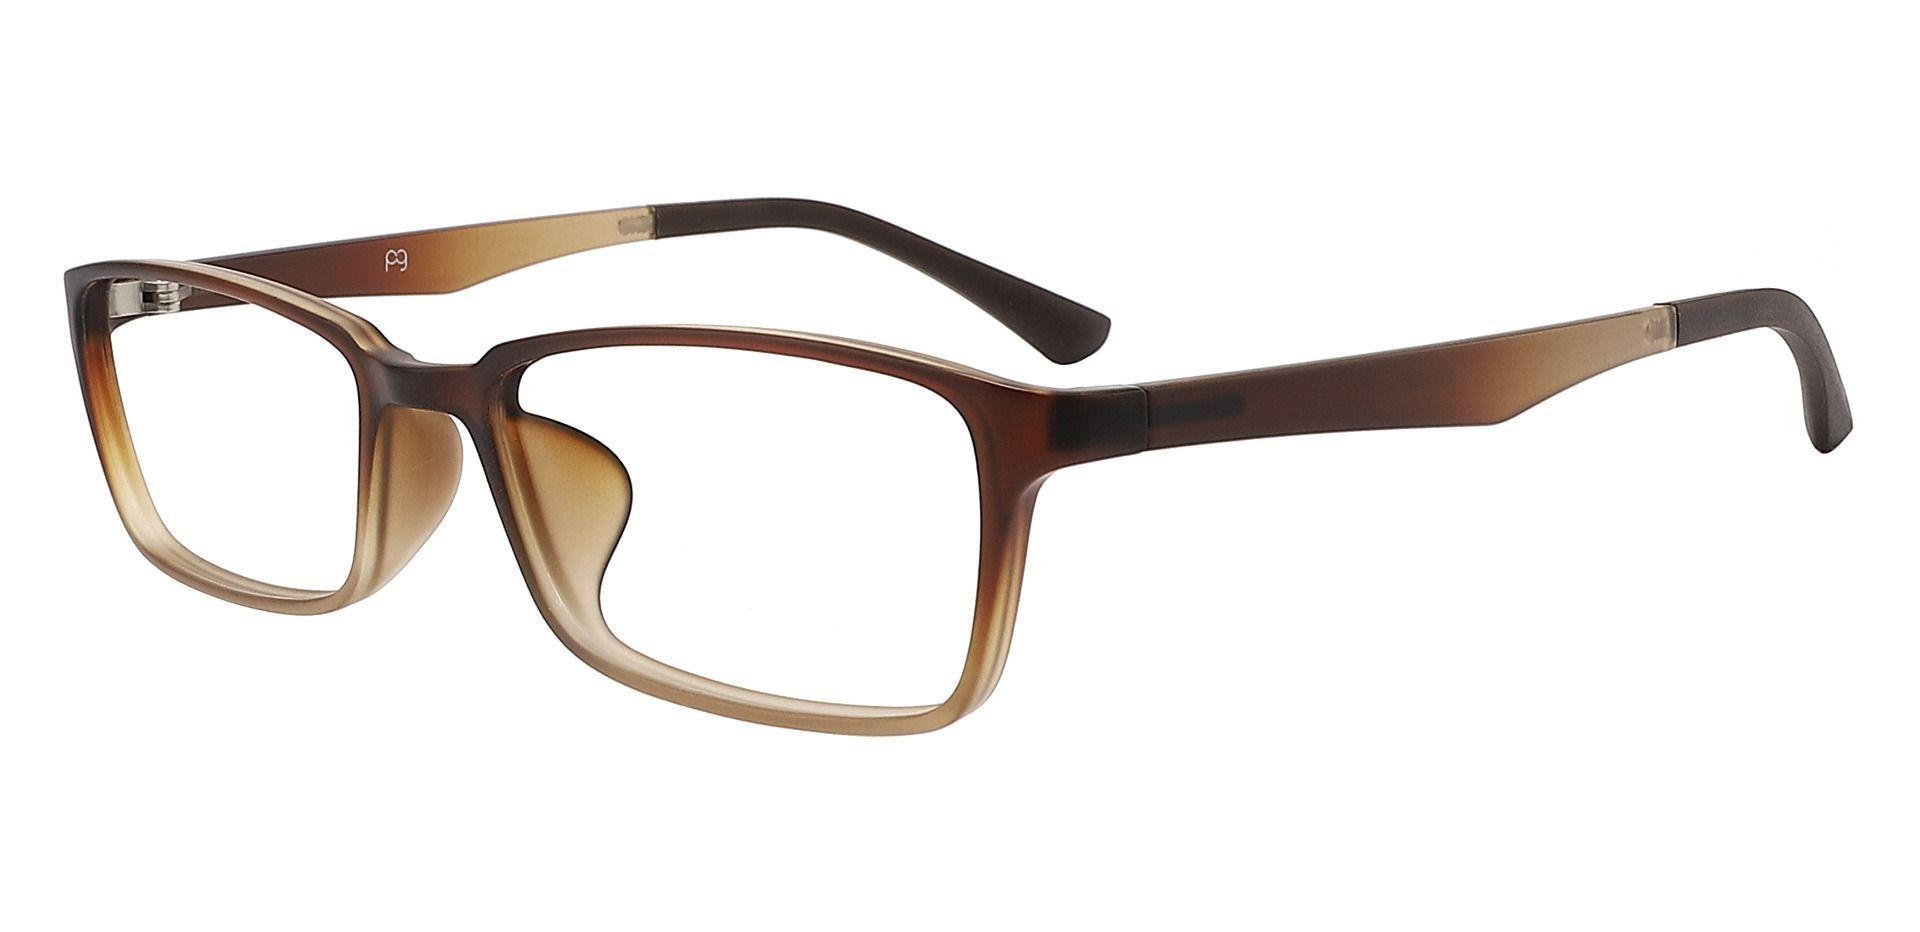 Brooks Rectangle Prescription Glasses - Brown